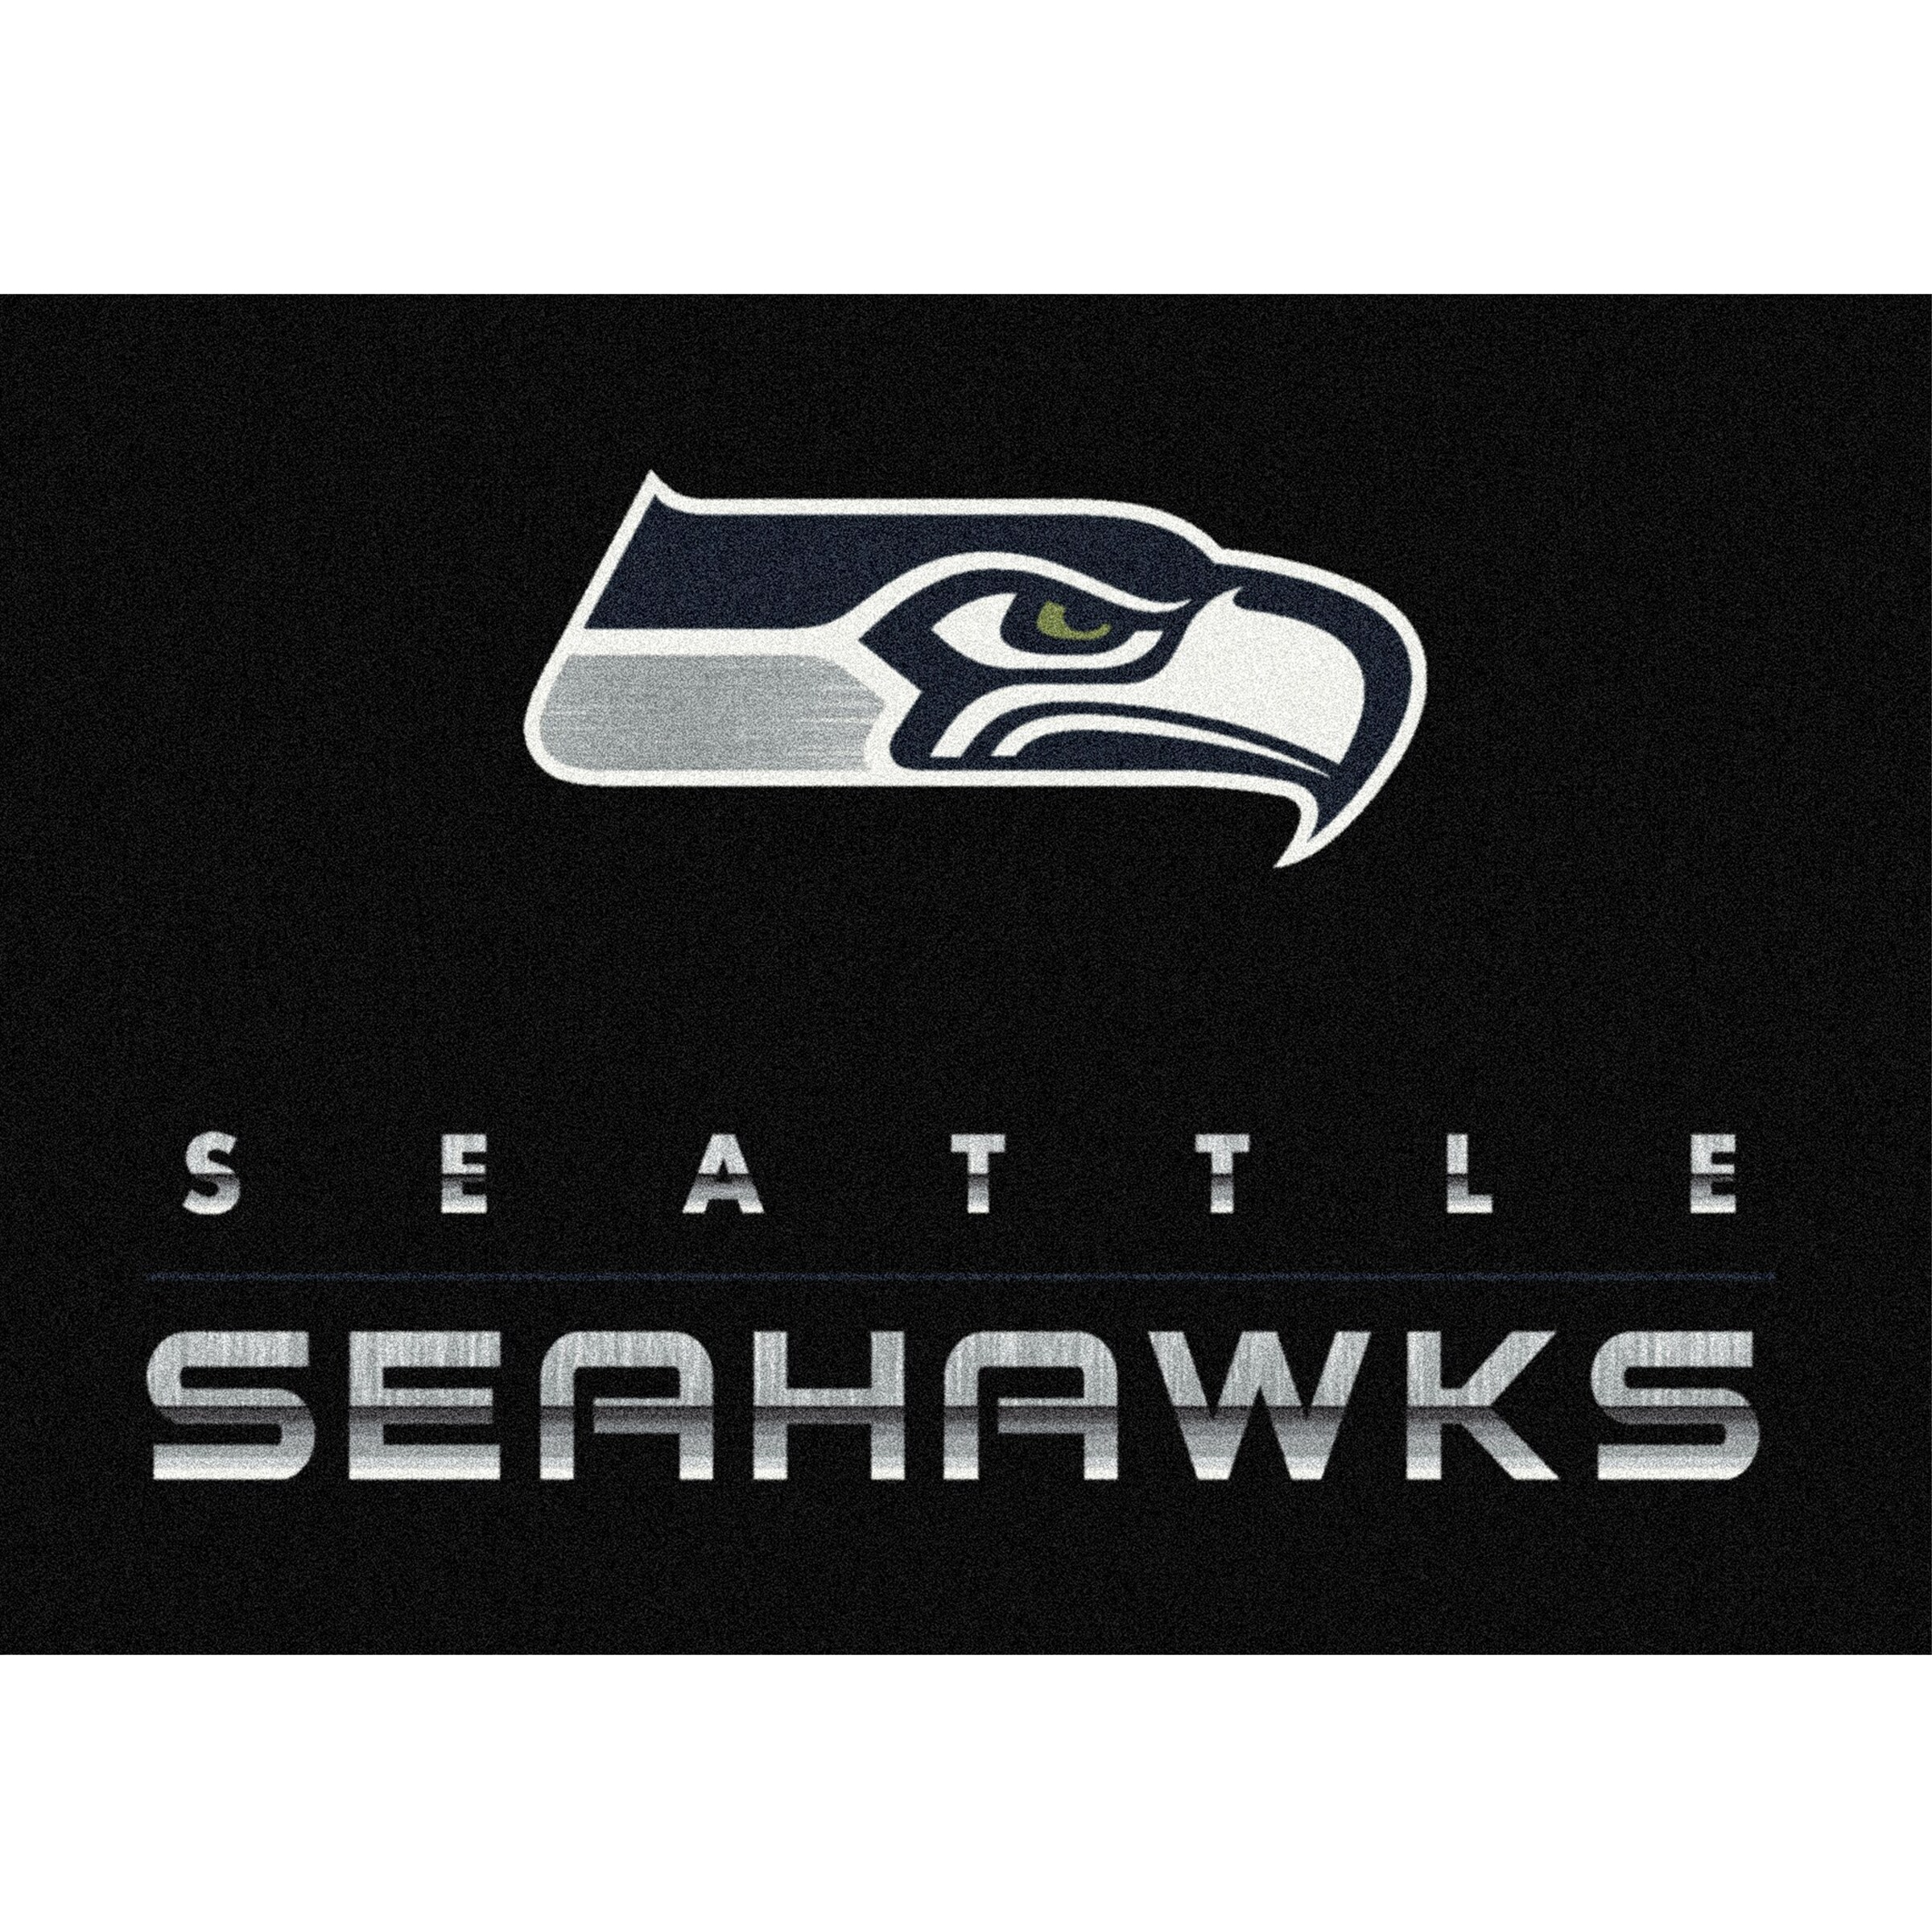 Seattle Seahawks Imperial 3'10'' x 5'4'' Chrome Rug